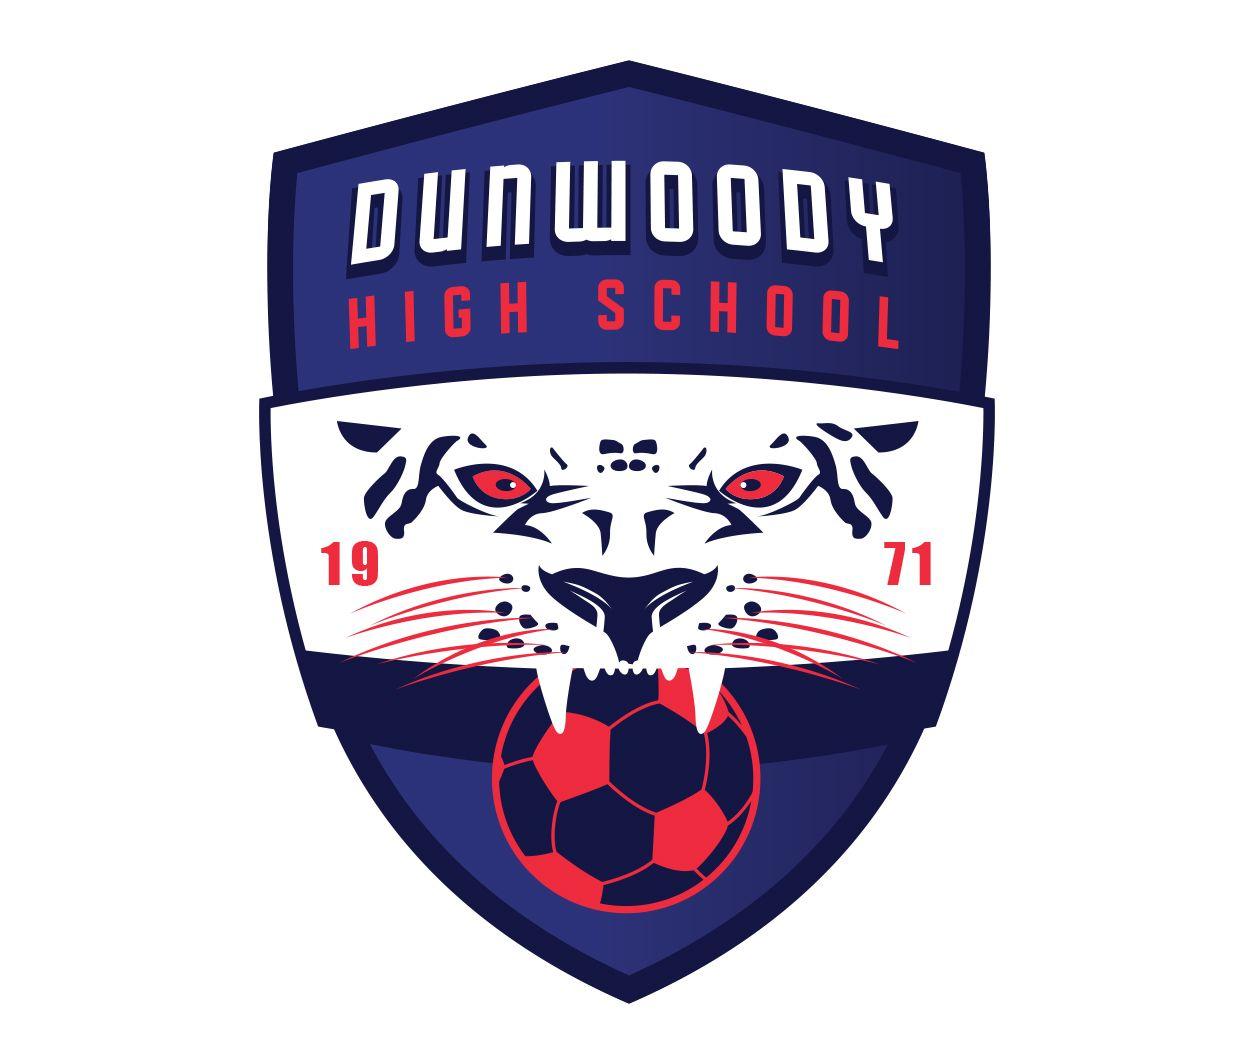 soccer crest design option for a high school soccer team by jordan